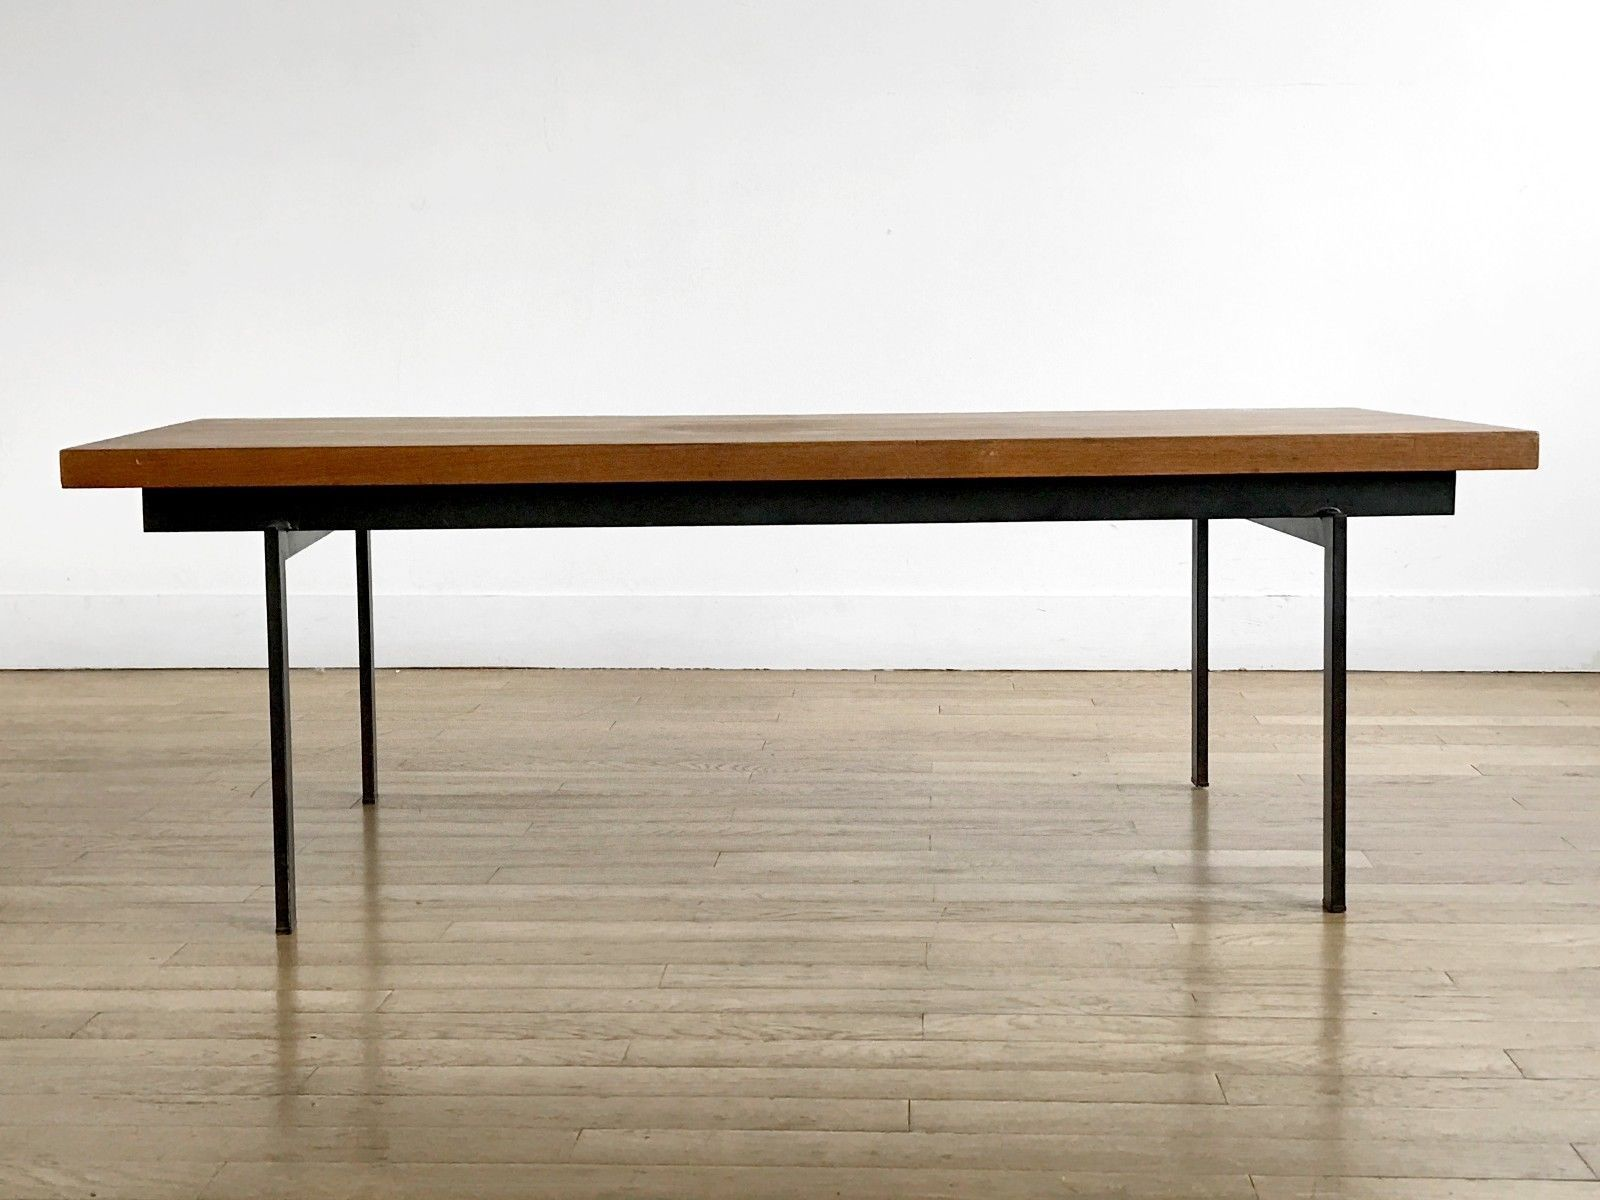 1950 Cees Braakman Pastoe Table Basse Moderniste Bauhaus Dansk